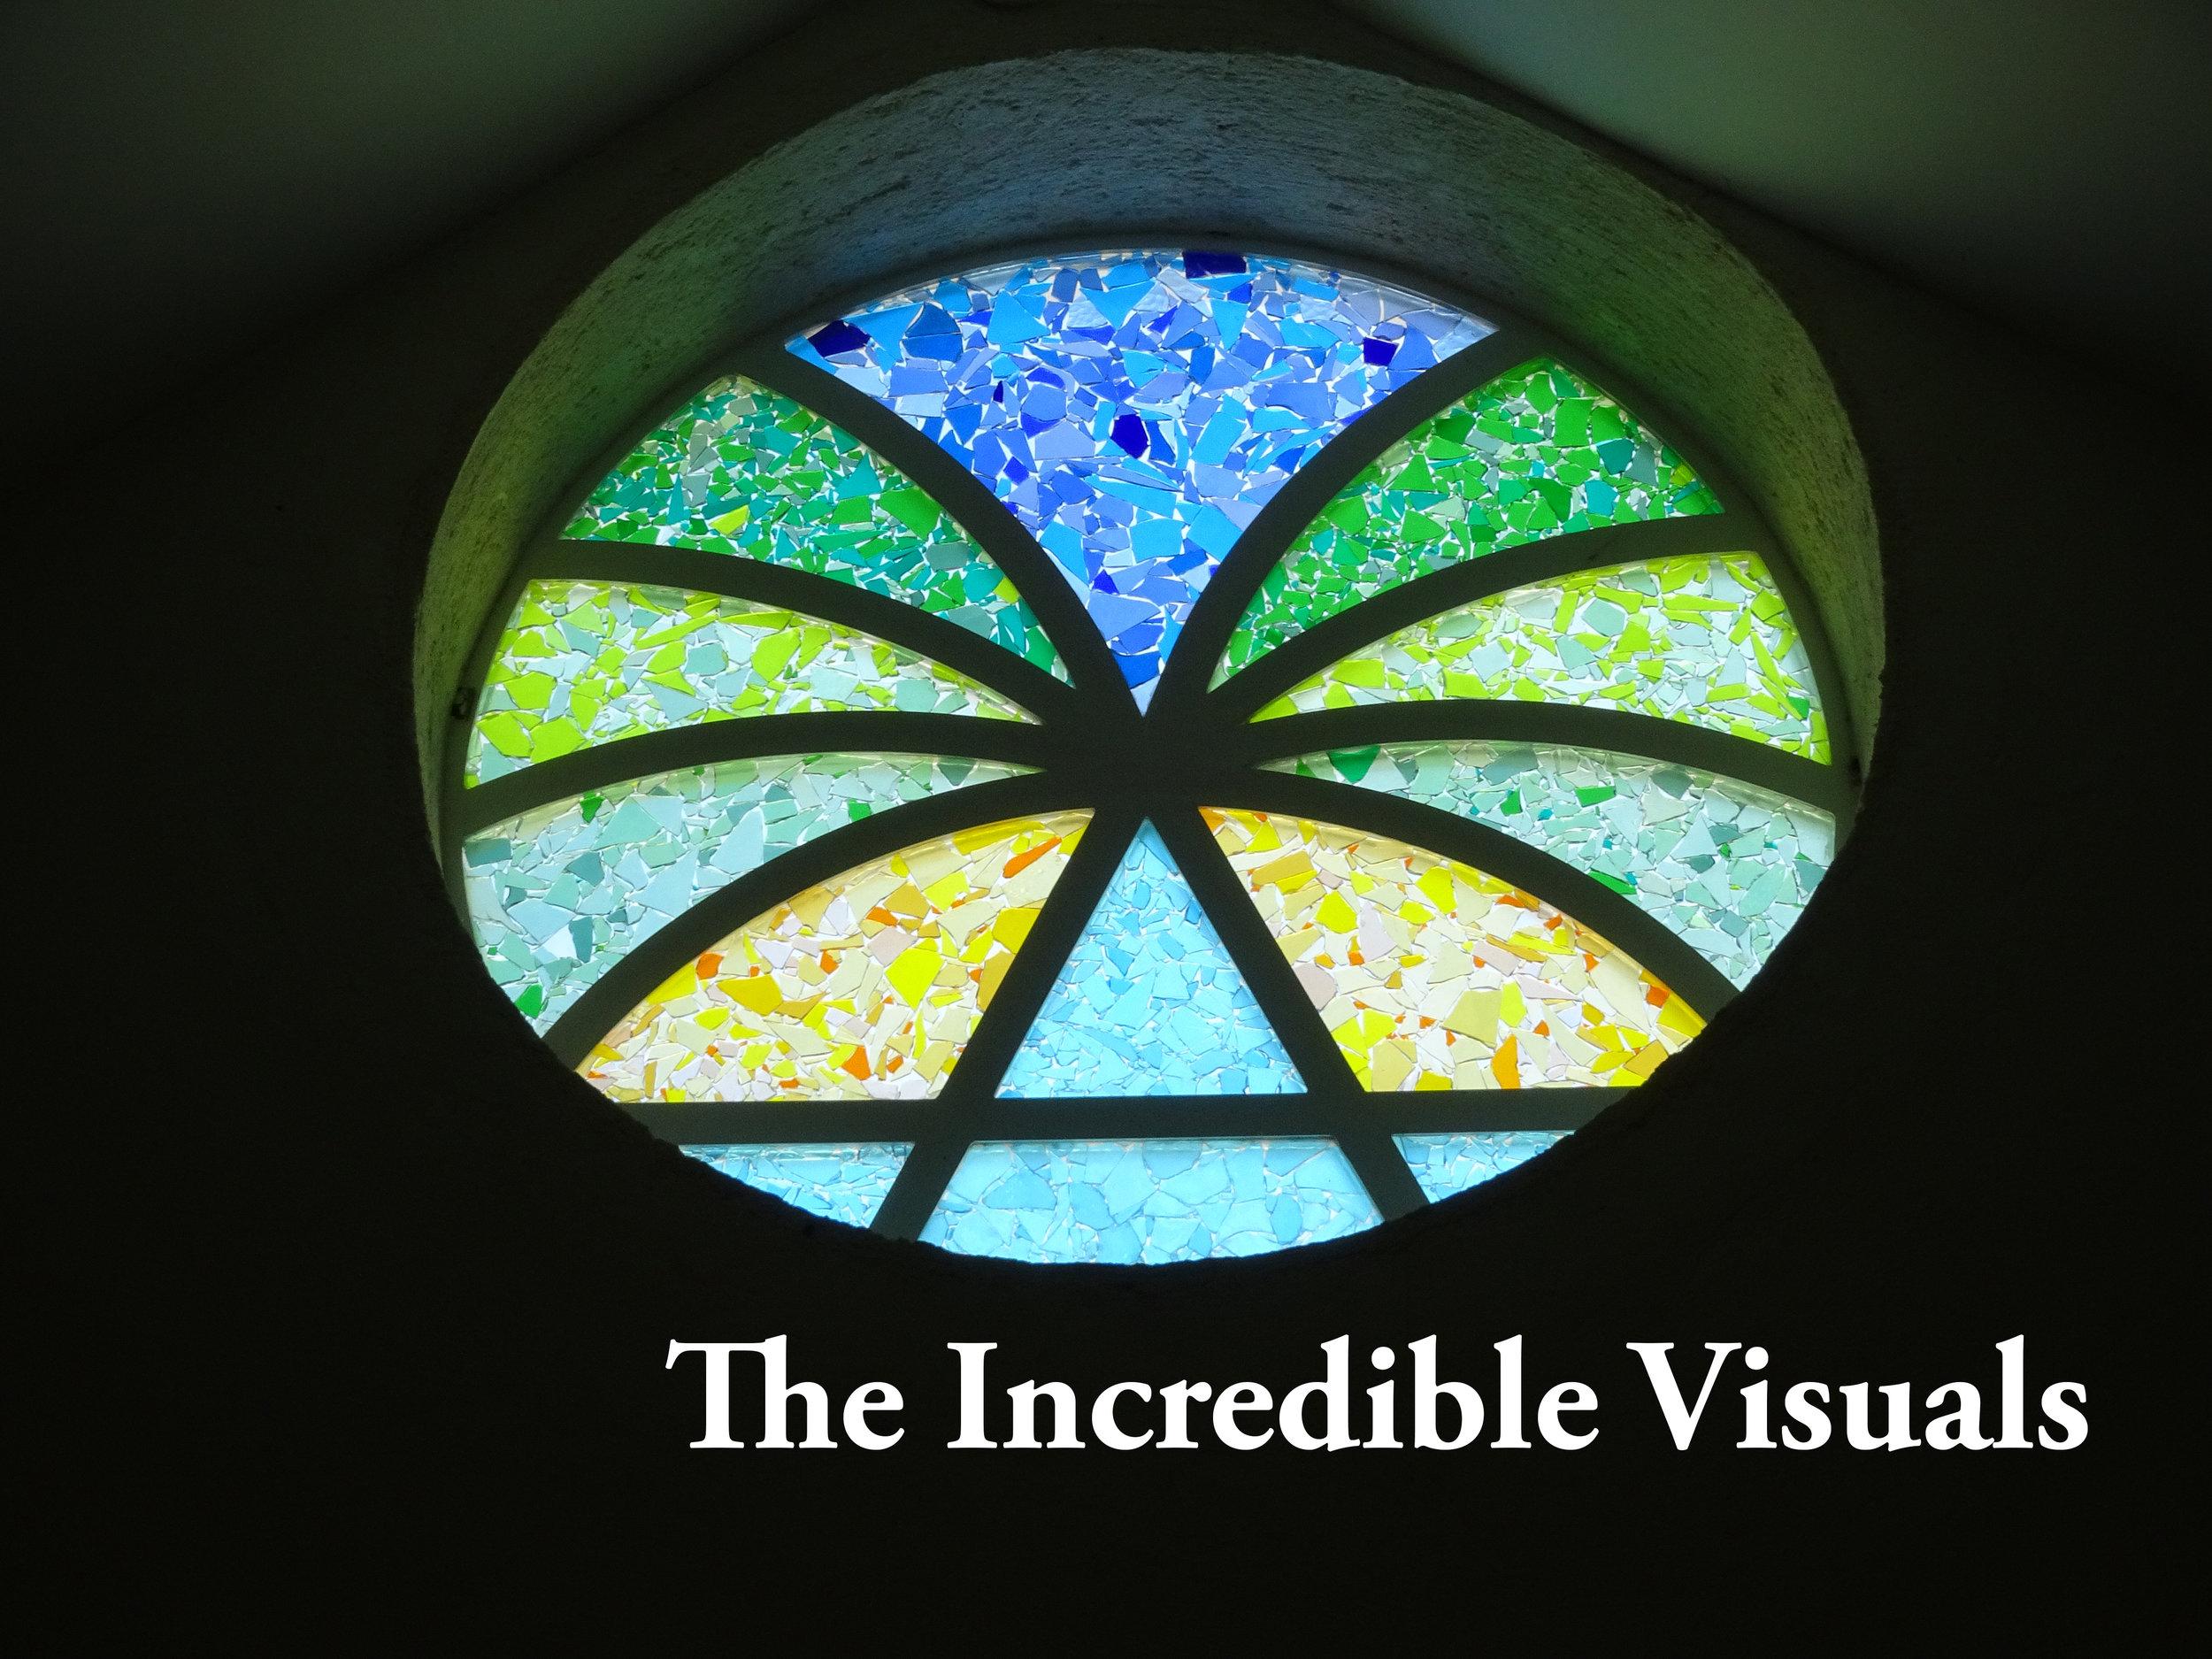 The Incredible Visuals.JPG